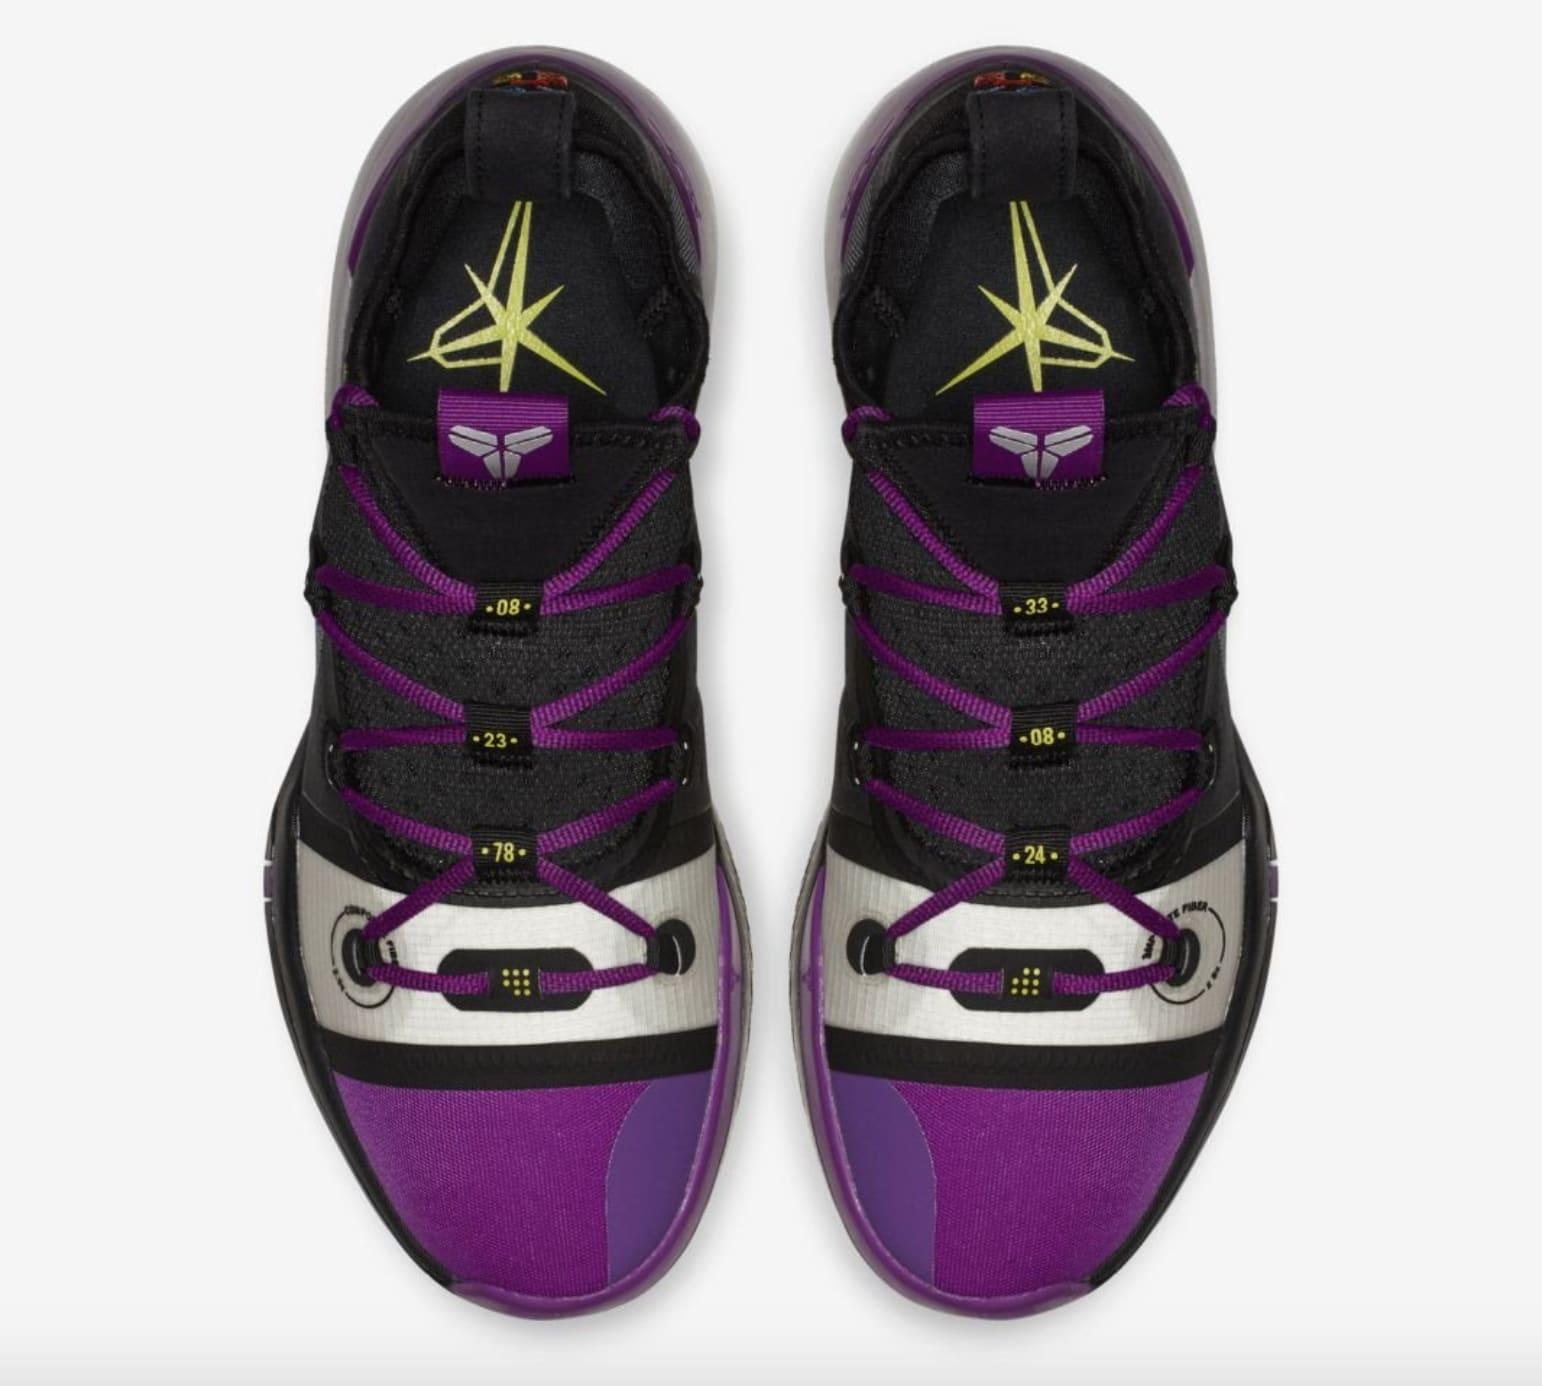 Nike Kobe A.D. 2018 'Lakers' (Top)